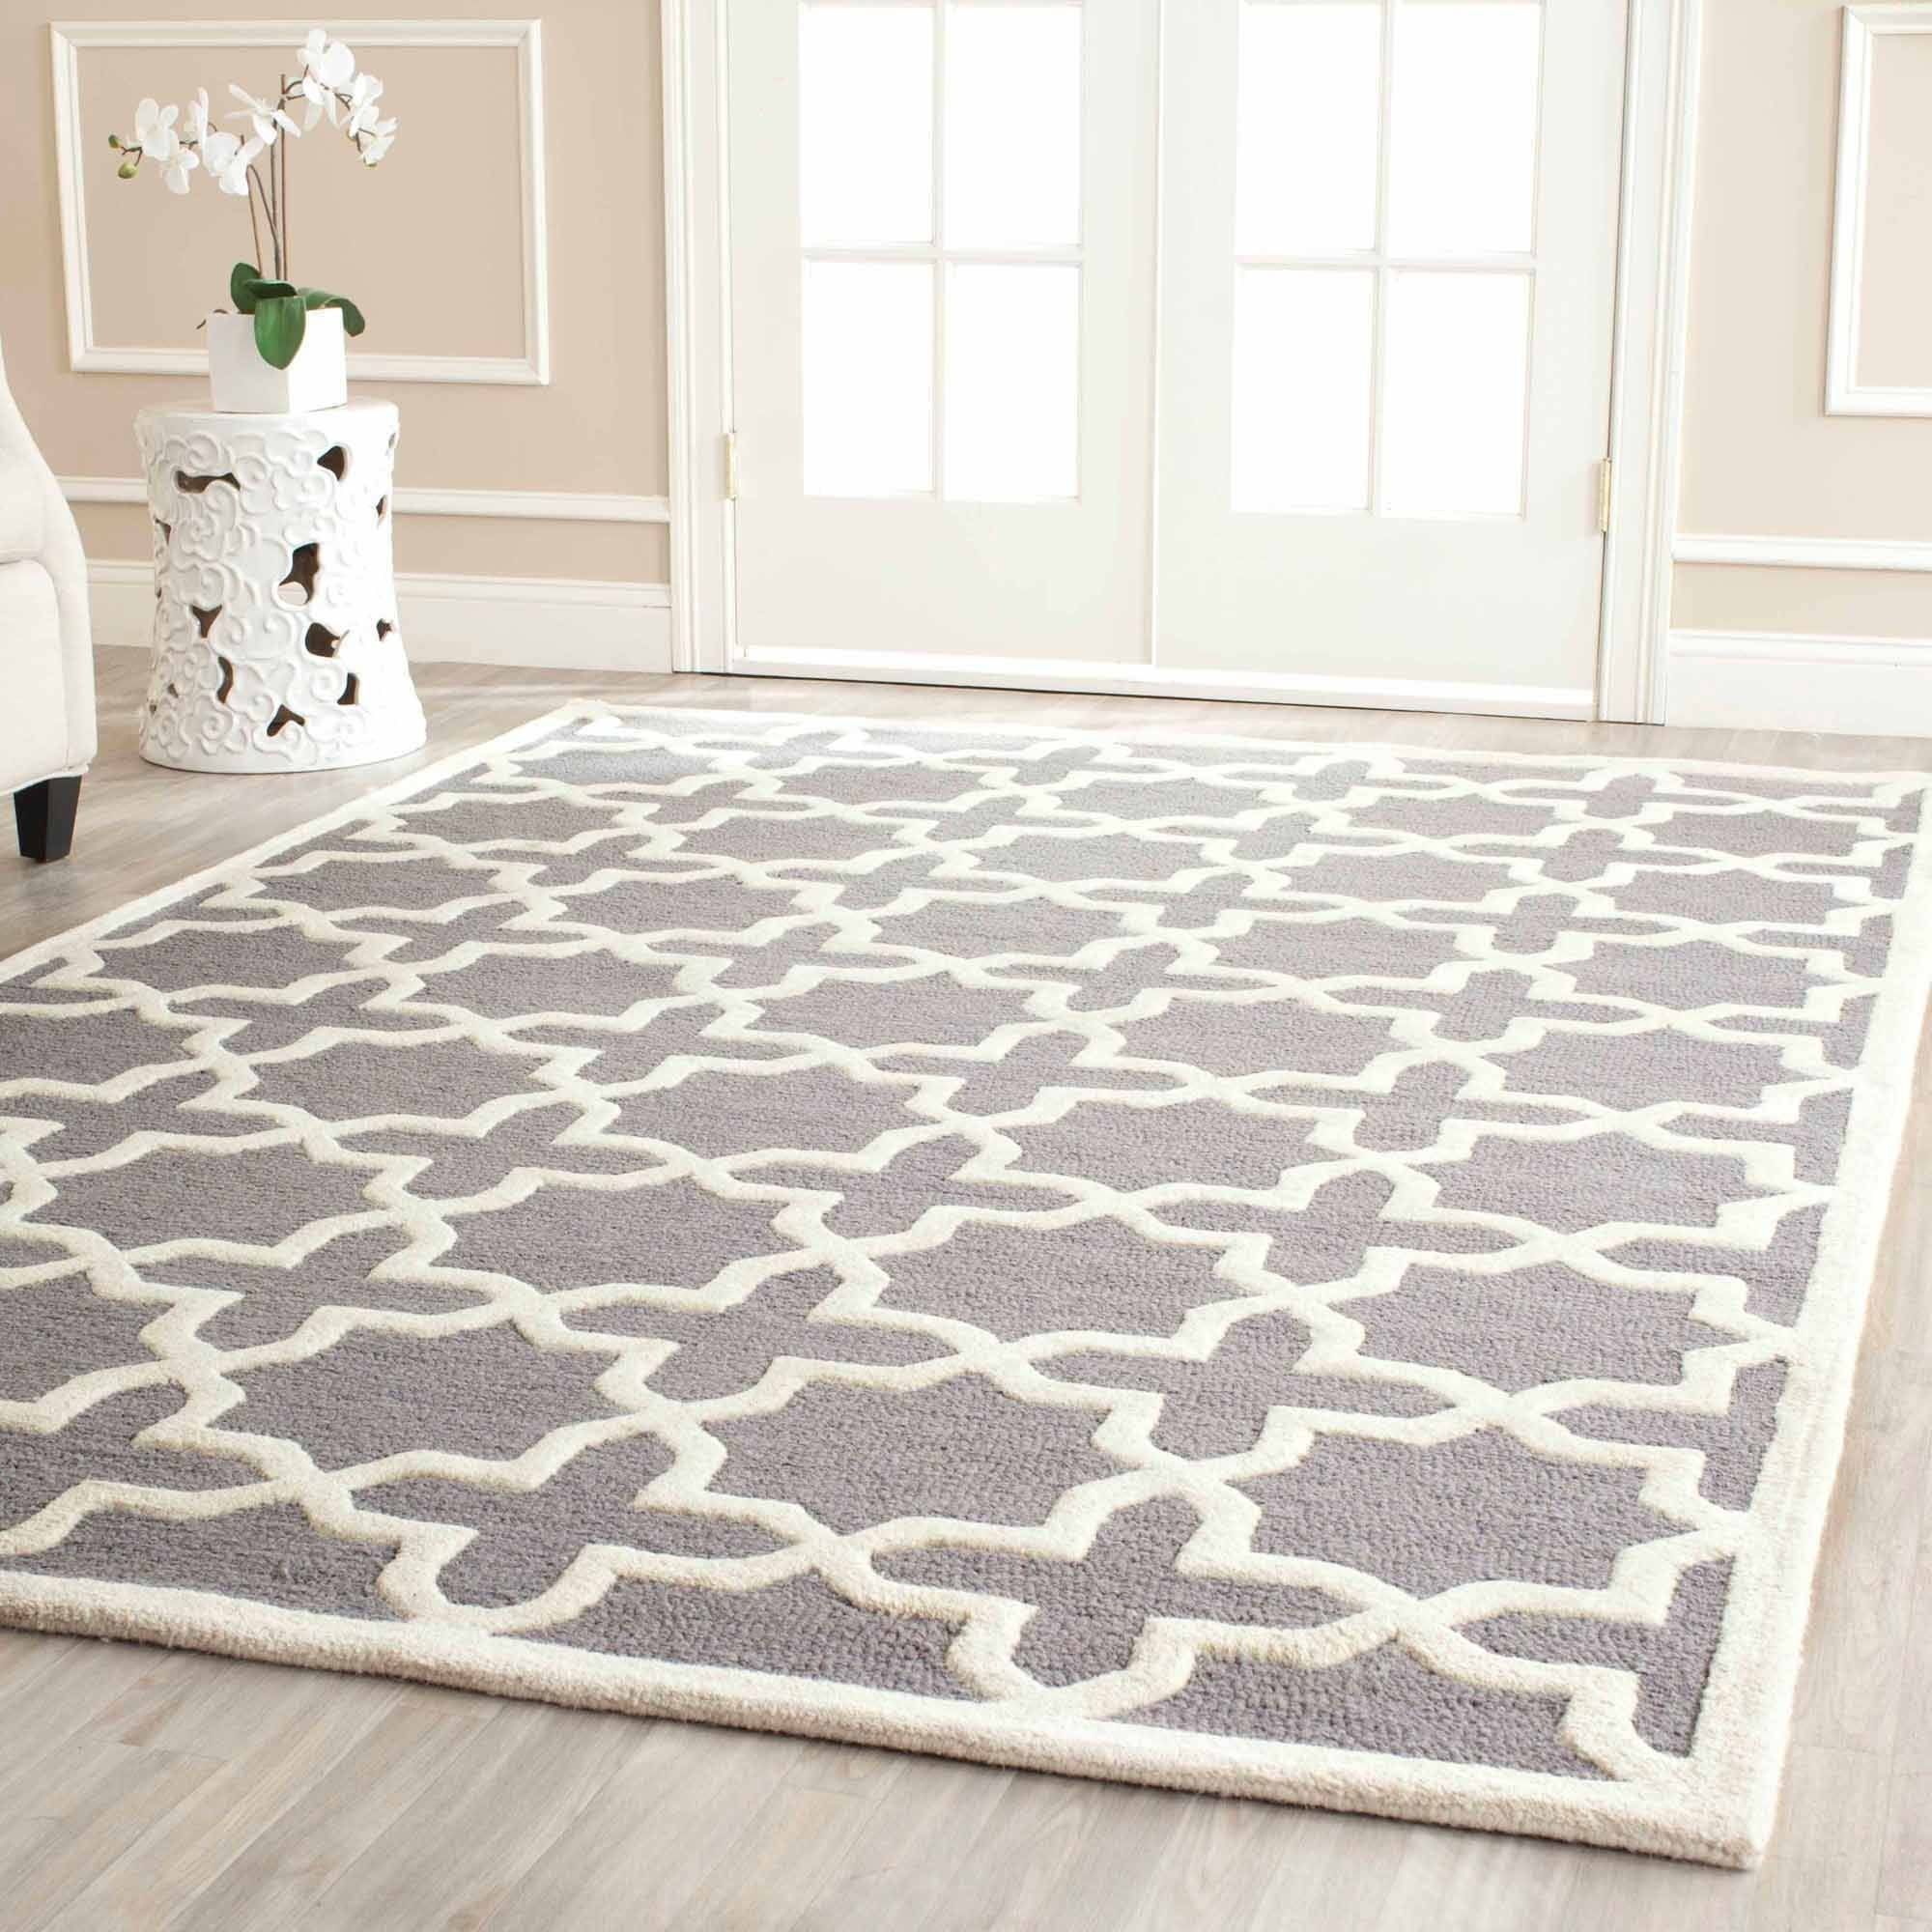 safavieh rugs safavieh cambridge liz hand tufted wool area rug or runner DKCQRSY